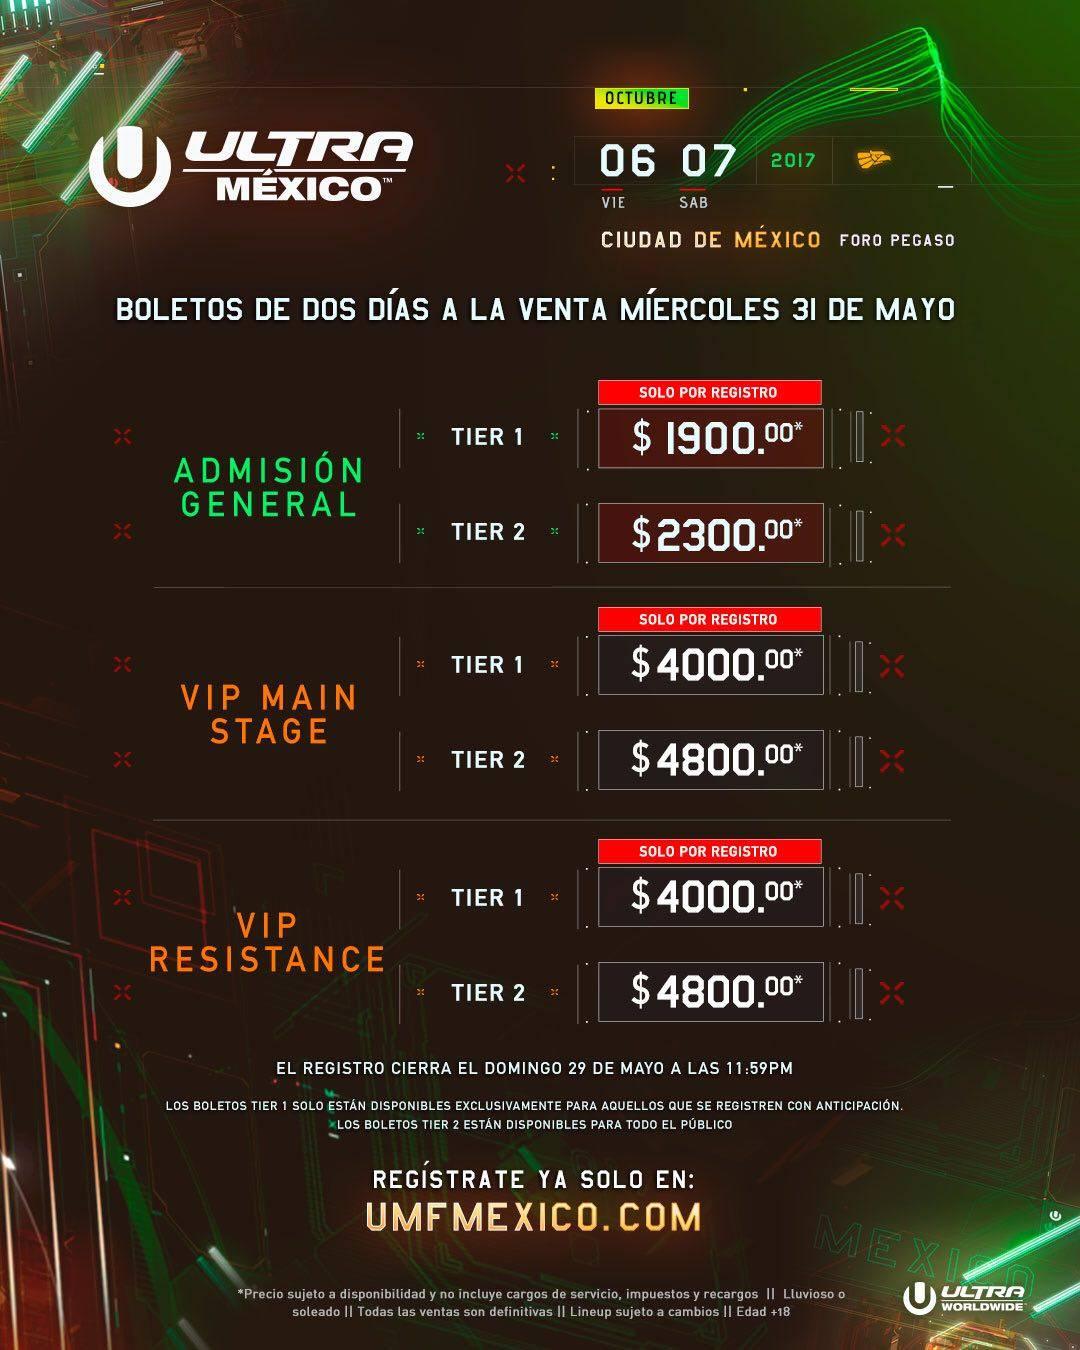 ultra-tickets-pic1.jpg